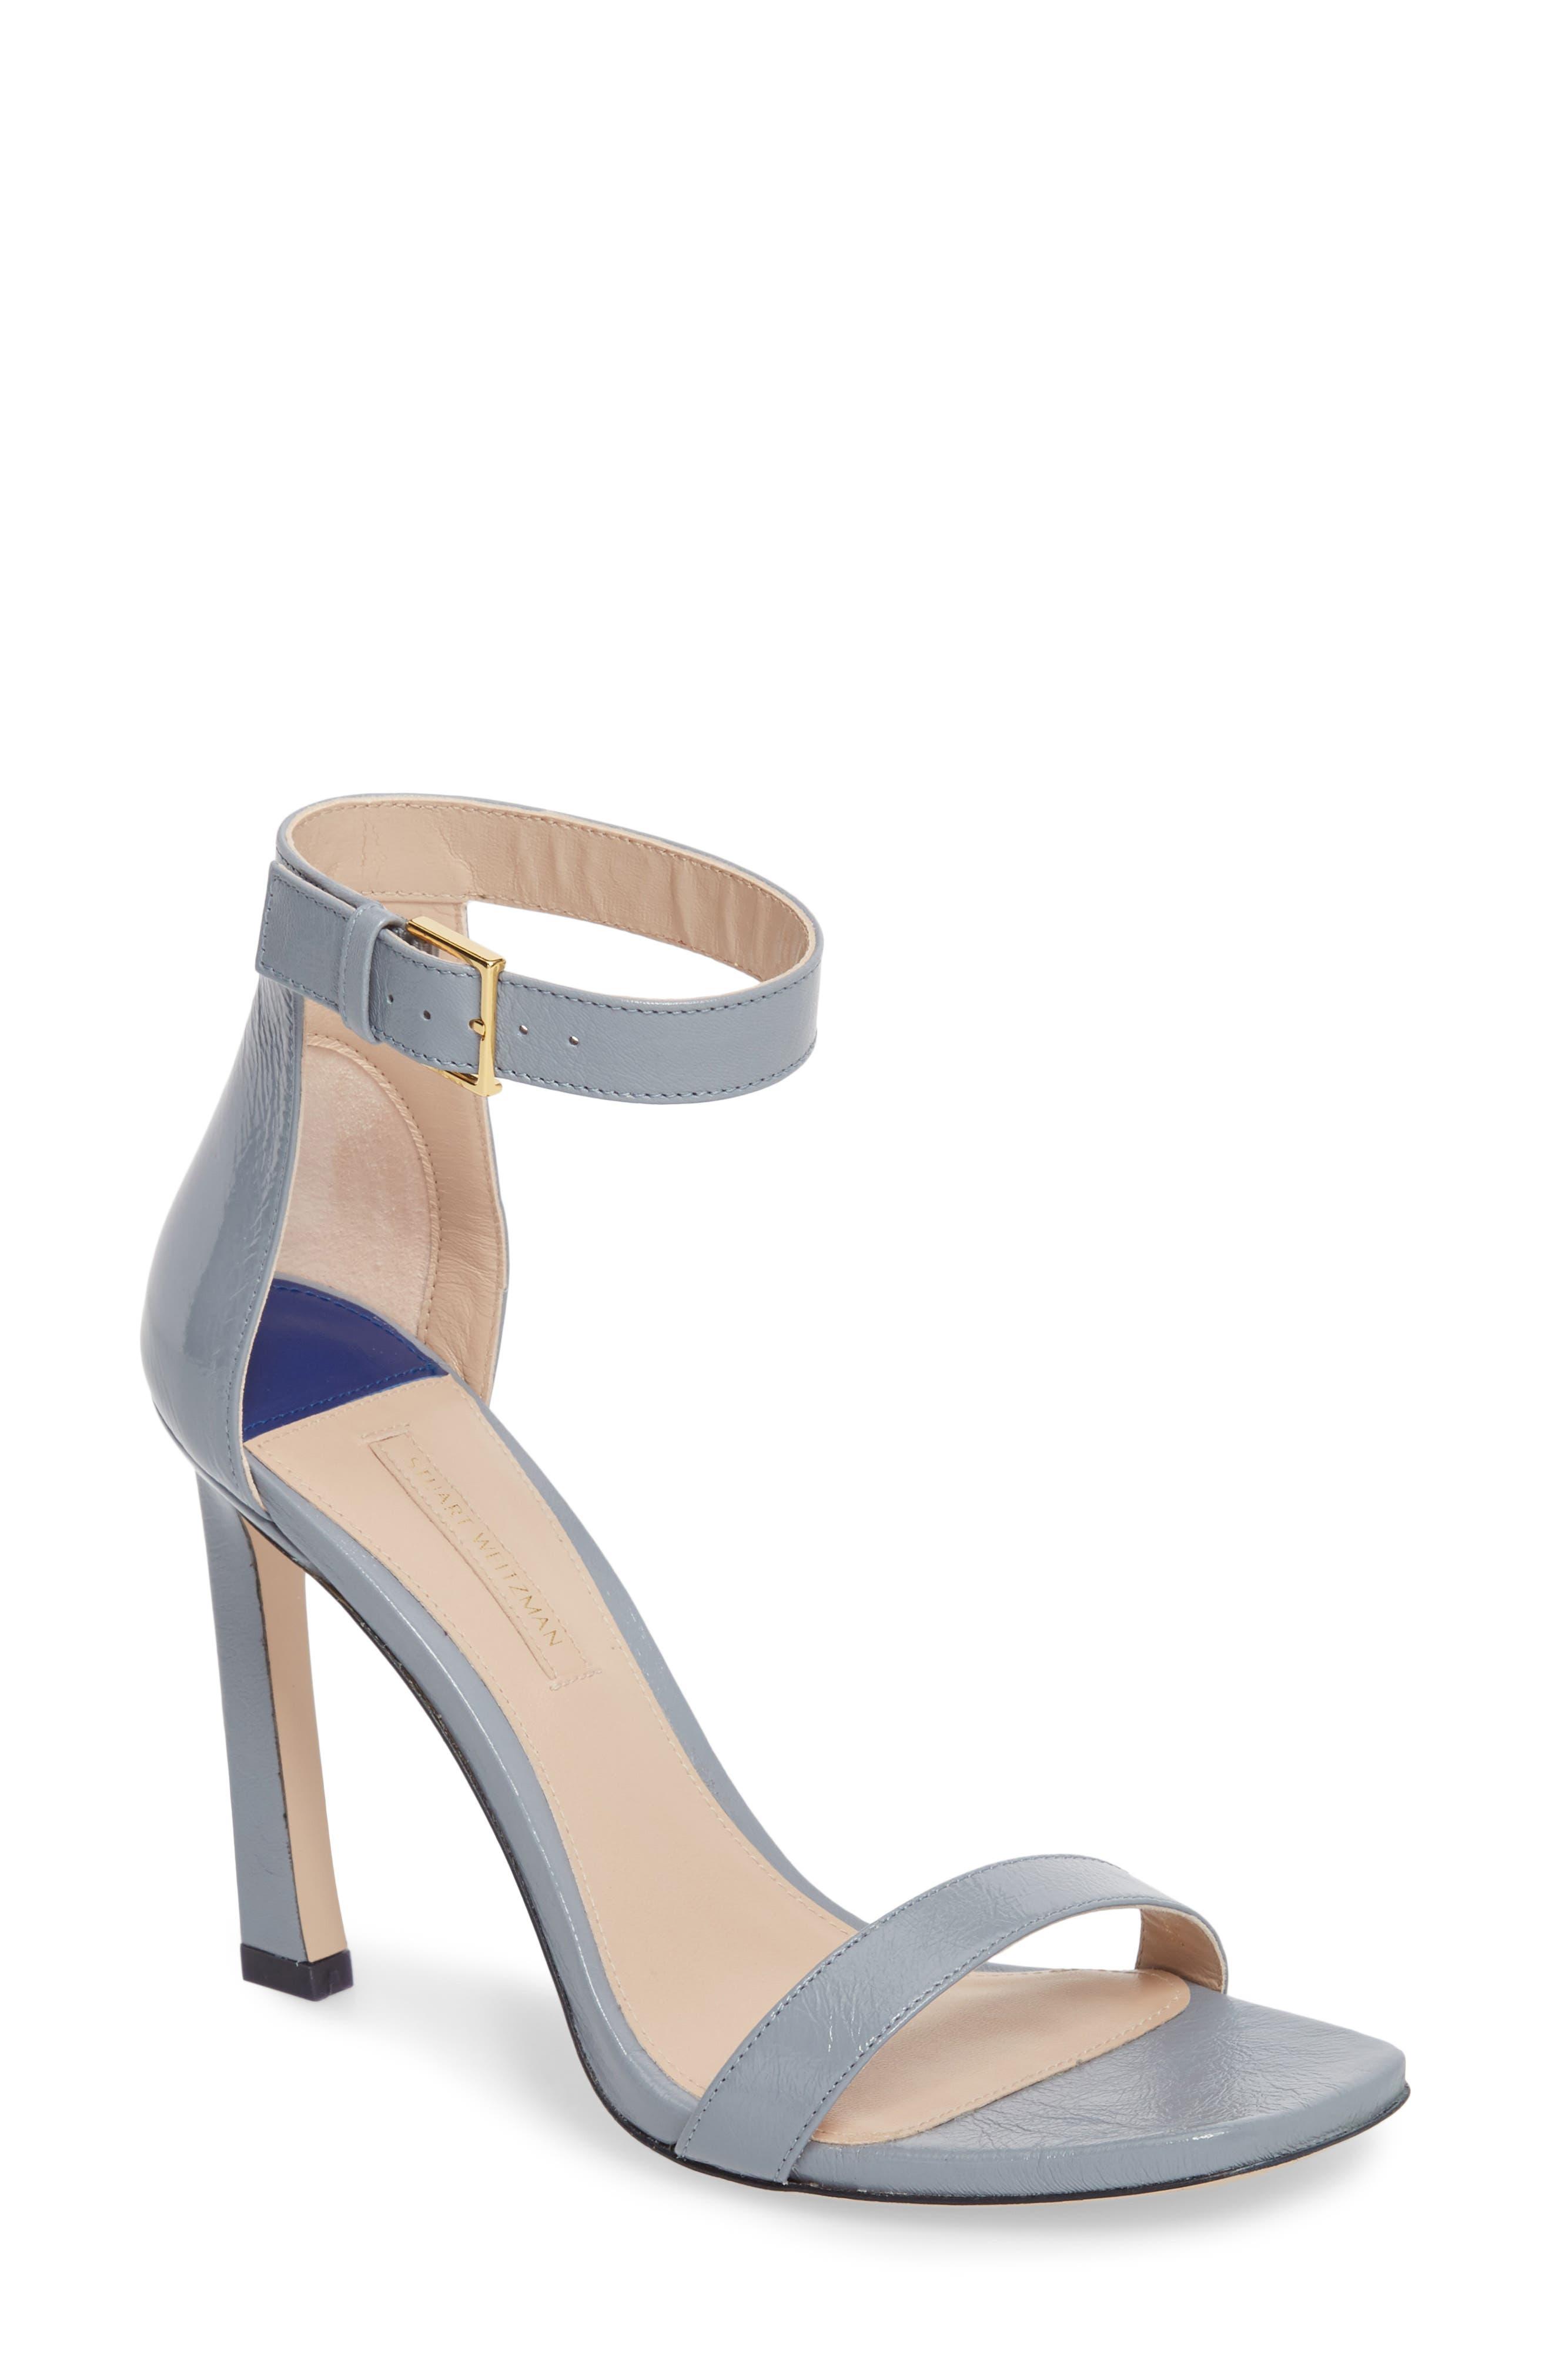 100SQUARENUDIST Sandal,                         Main,                         color, Dovetail Gleaming Tripon